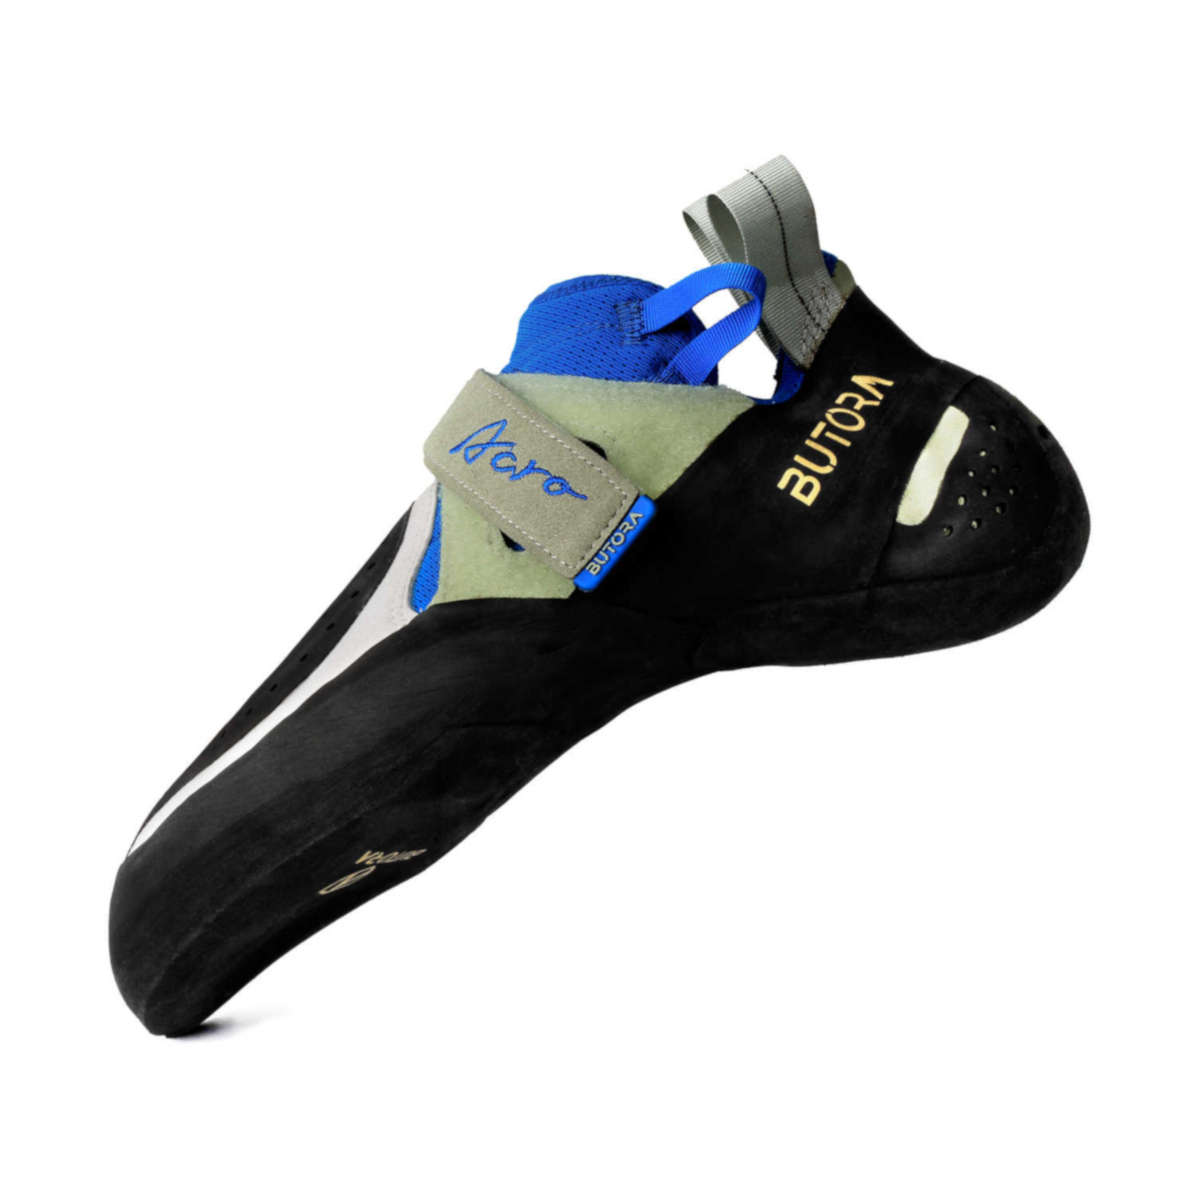 Butora Acro Blue (Narrow) Climbing Shoe